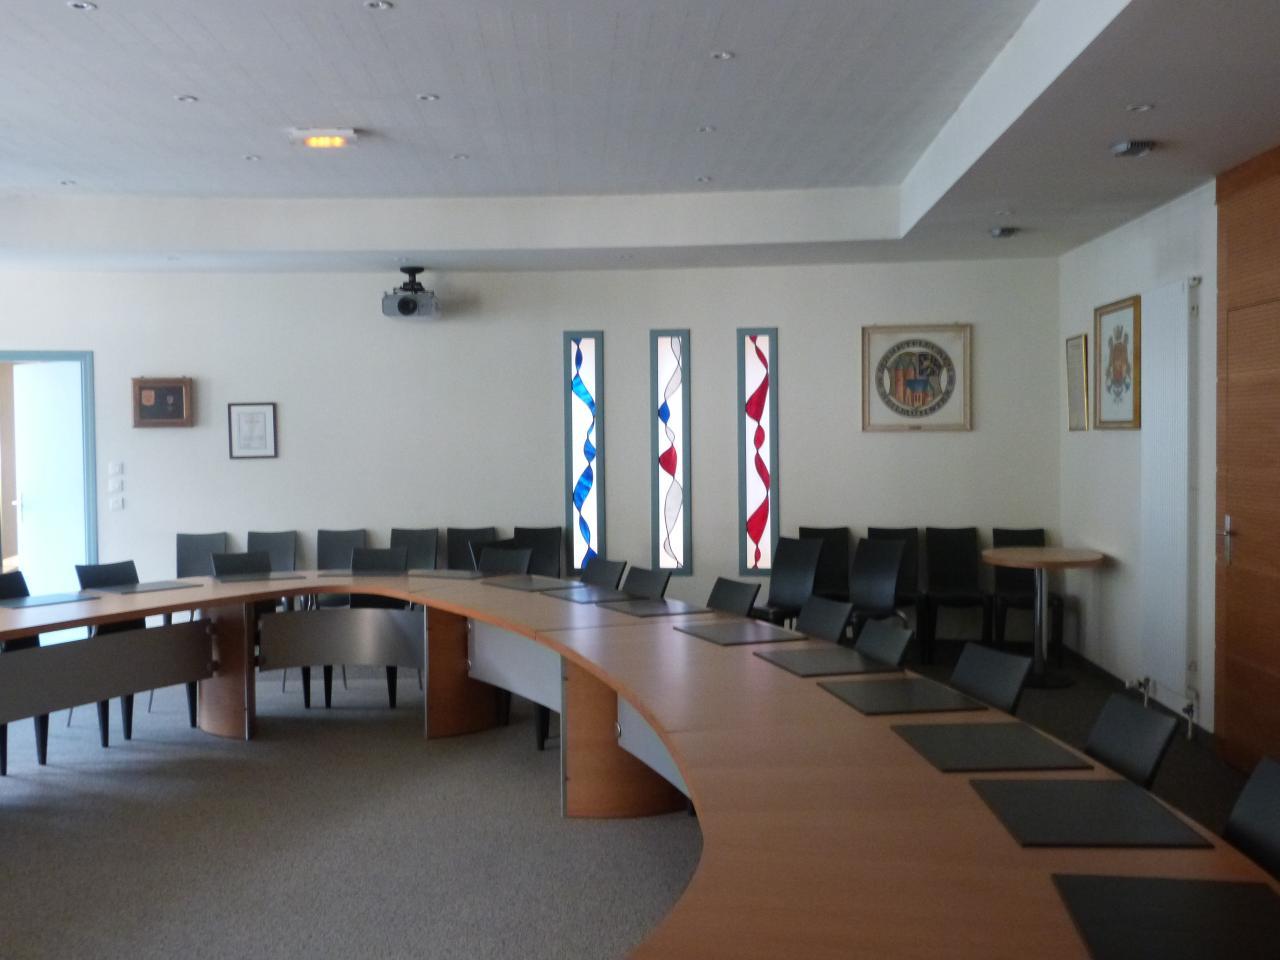 Salle du conseil vitrail bleu blanc rouge